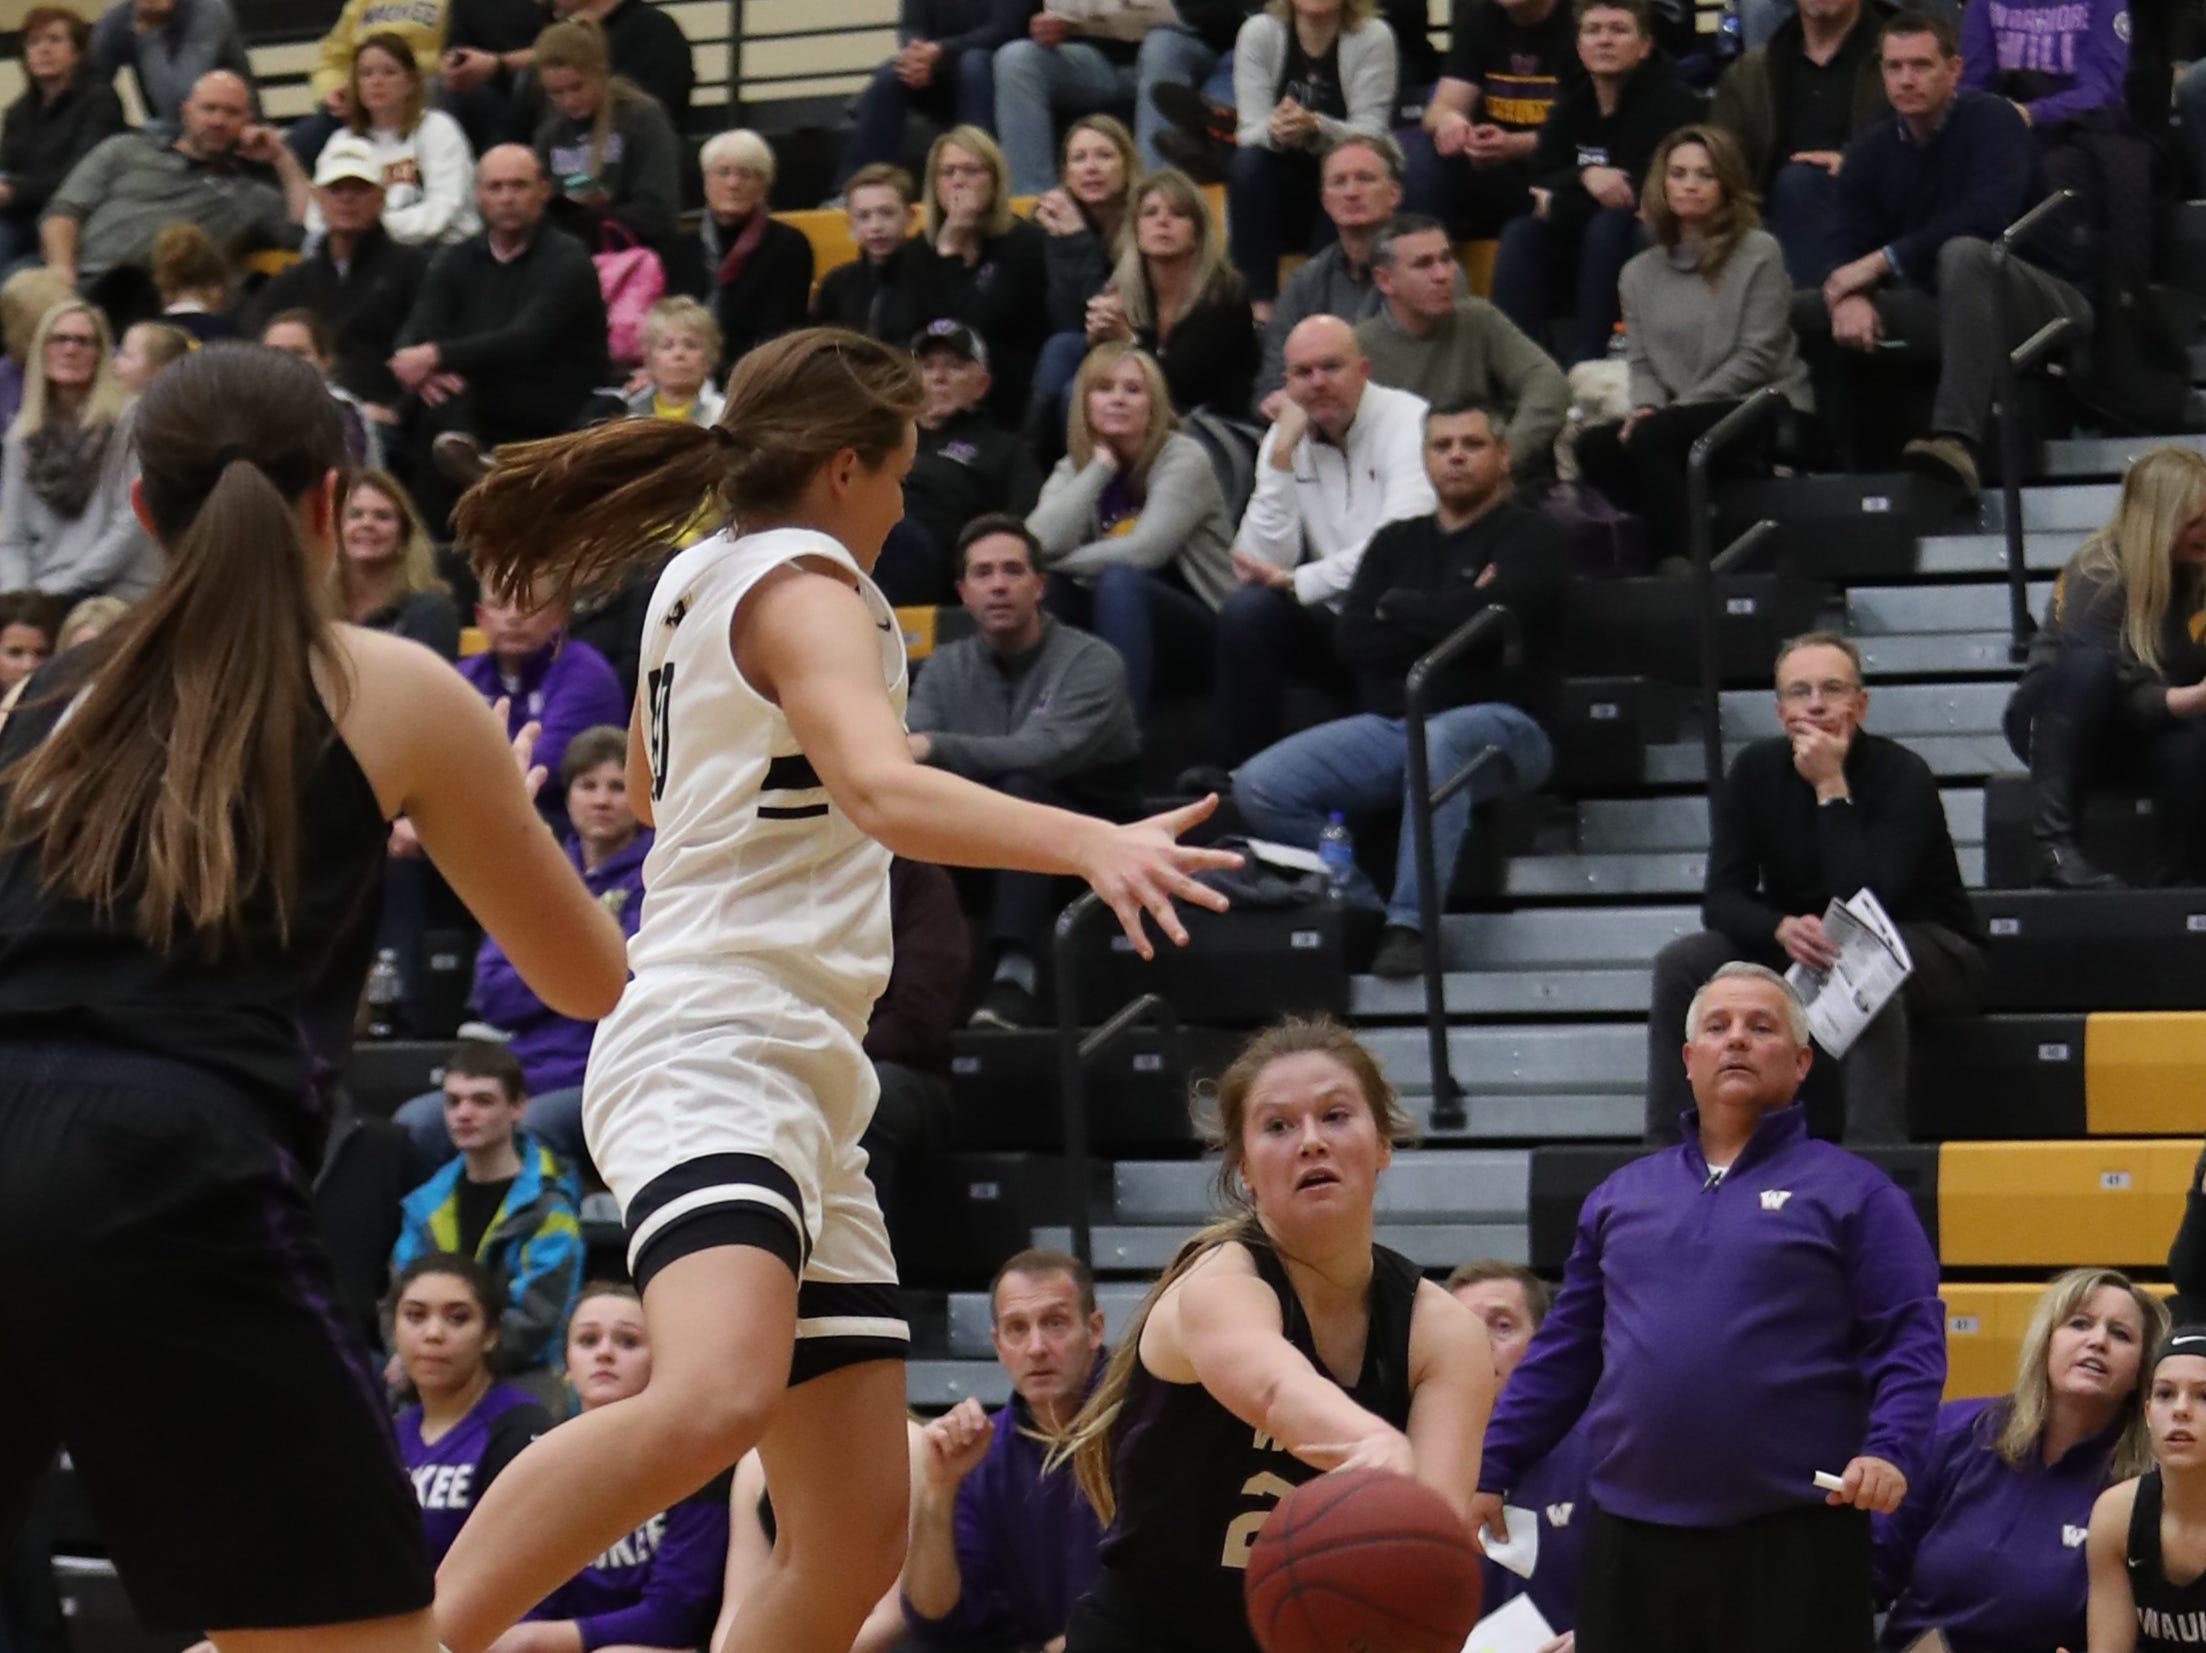 Waukee Warriors' Anna Brown (20) passes the ball during a game Feb. 1, 2019 at Southeast Polk High School.